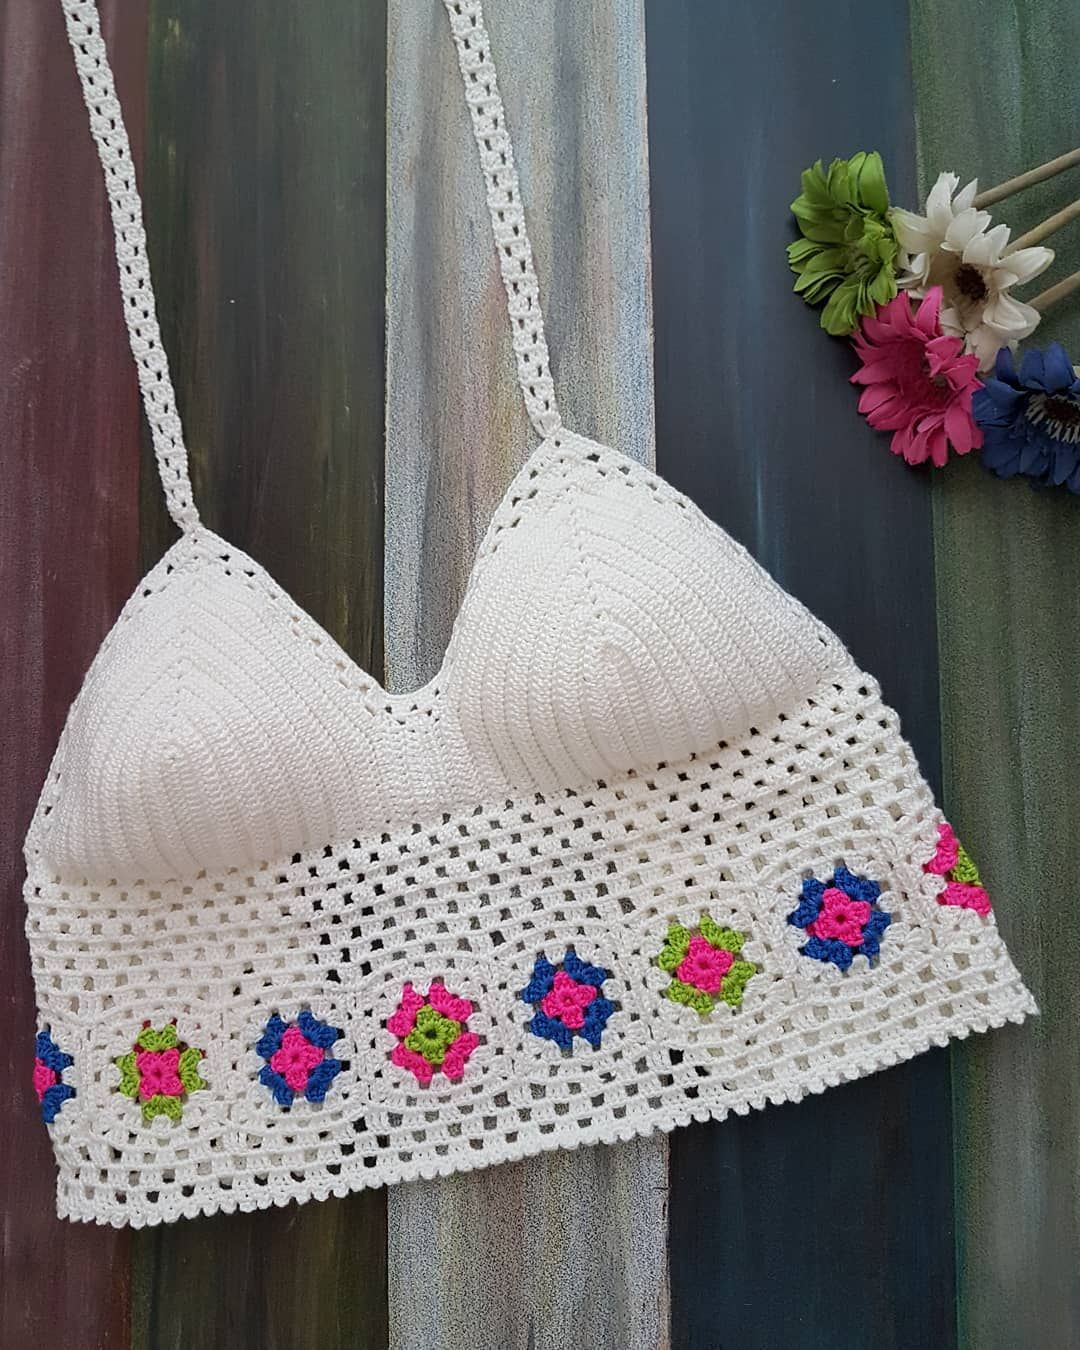 6828f86d3c0c82 Most beautiful knitted bikini models - Page 15 of 30